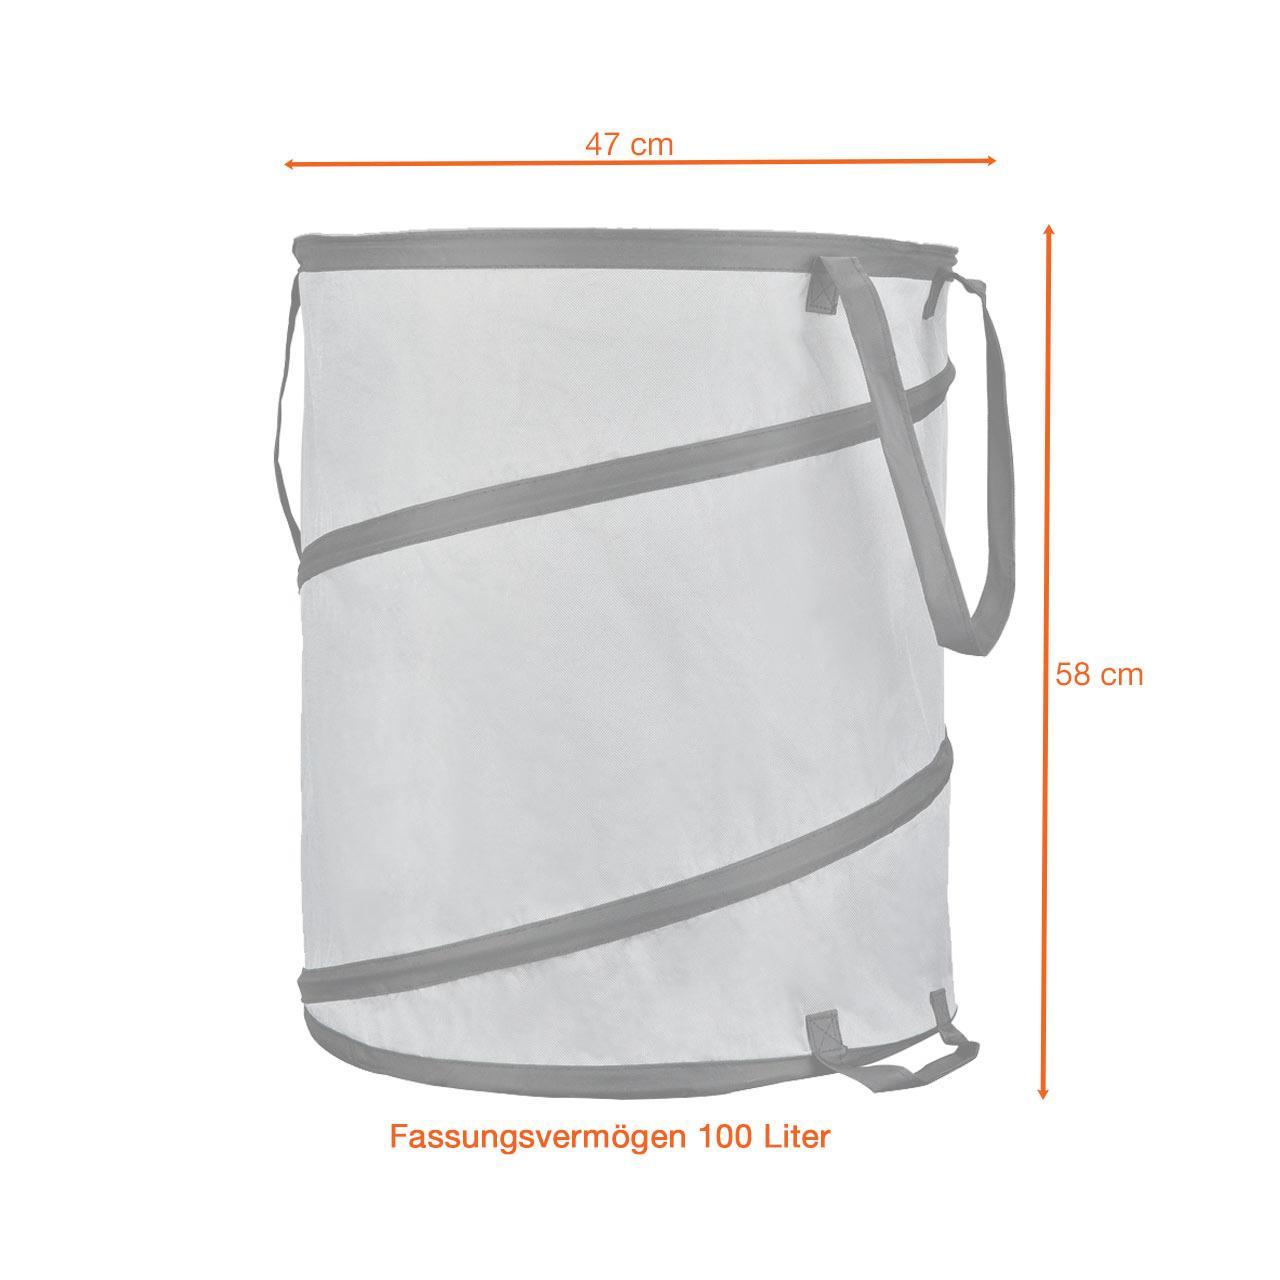 FUXTEC Gartenabfallbehälter FX-GB100 3er Set